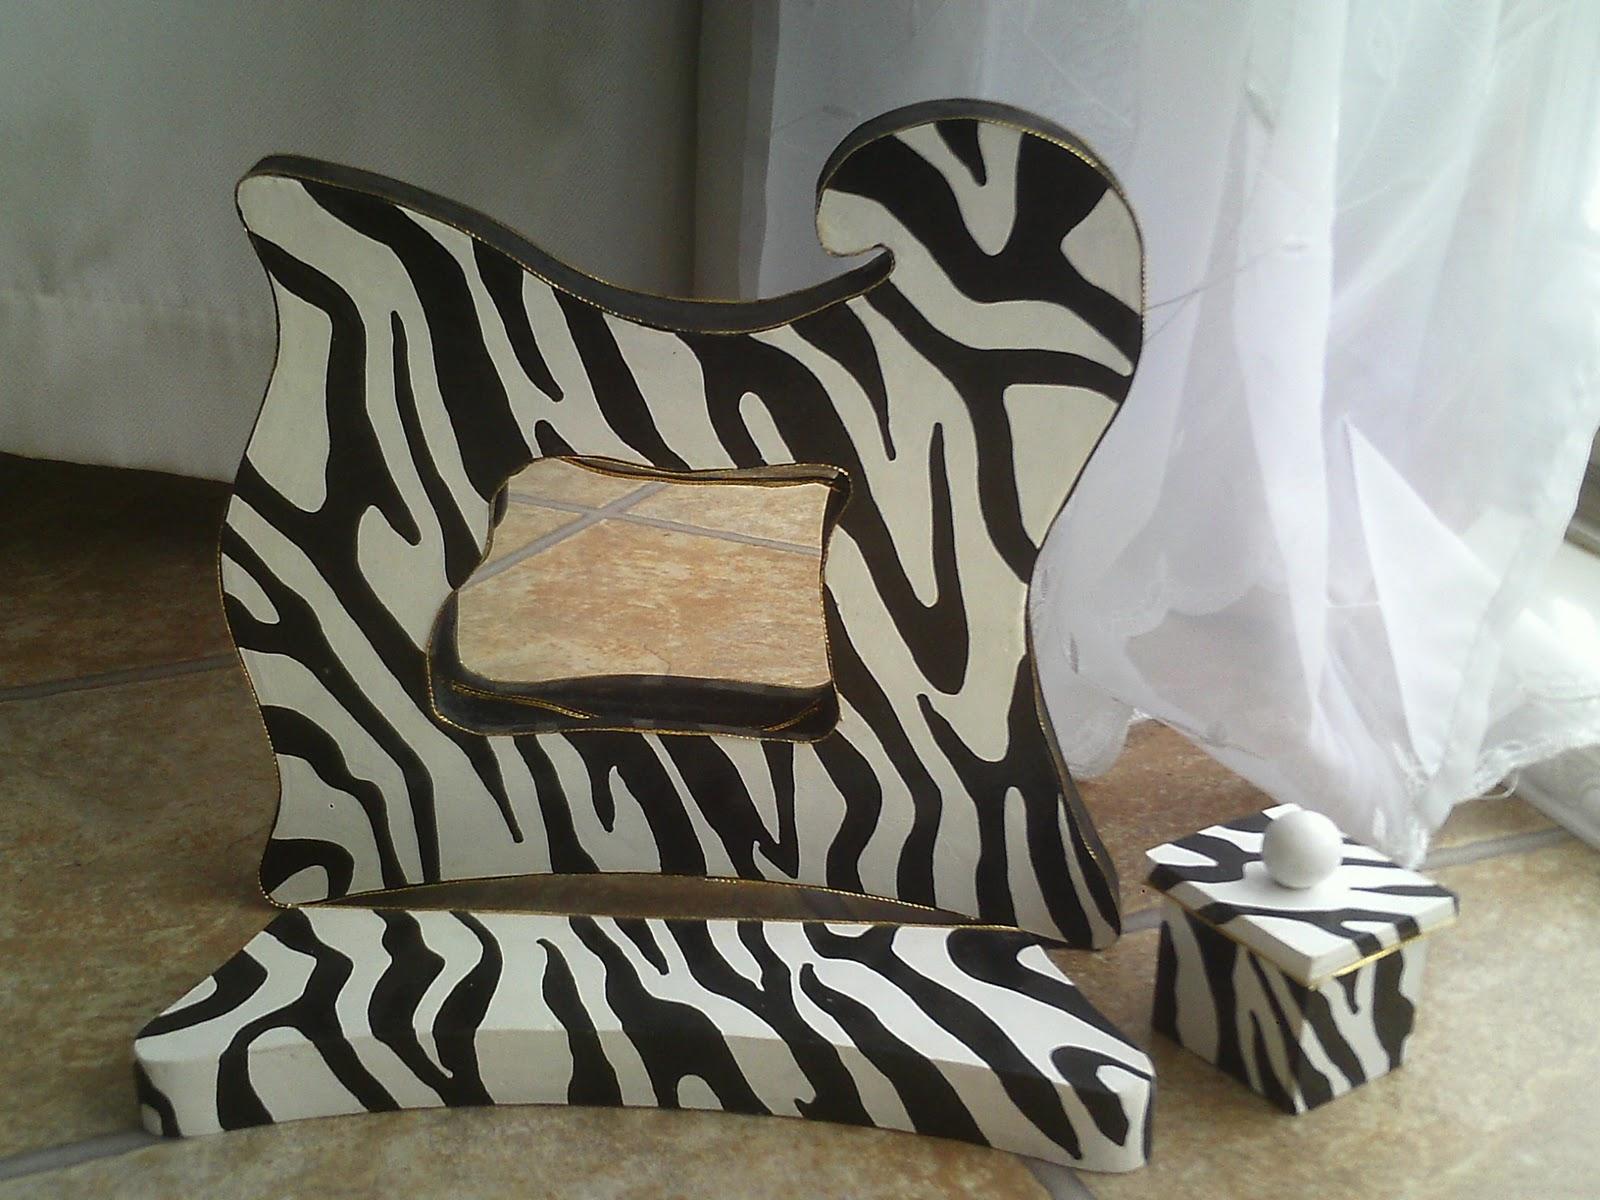 Galerie meubles for Miroir zebre